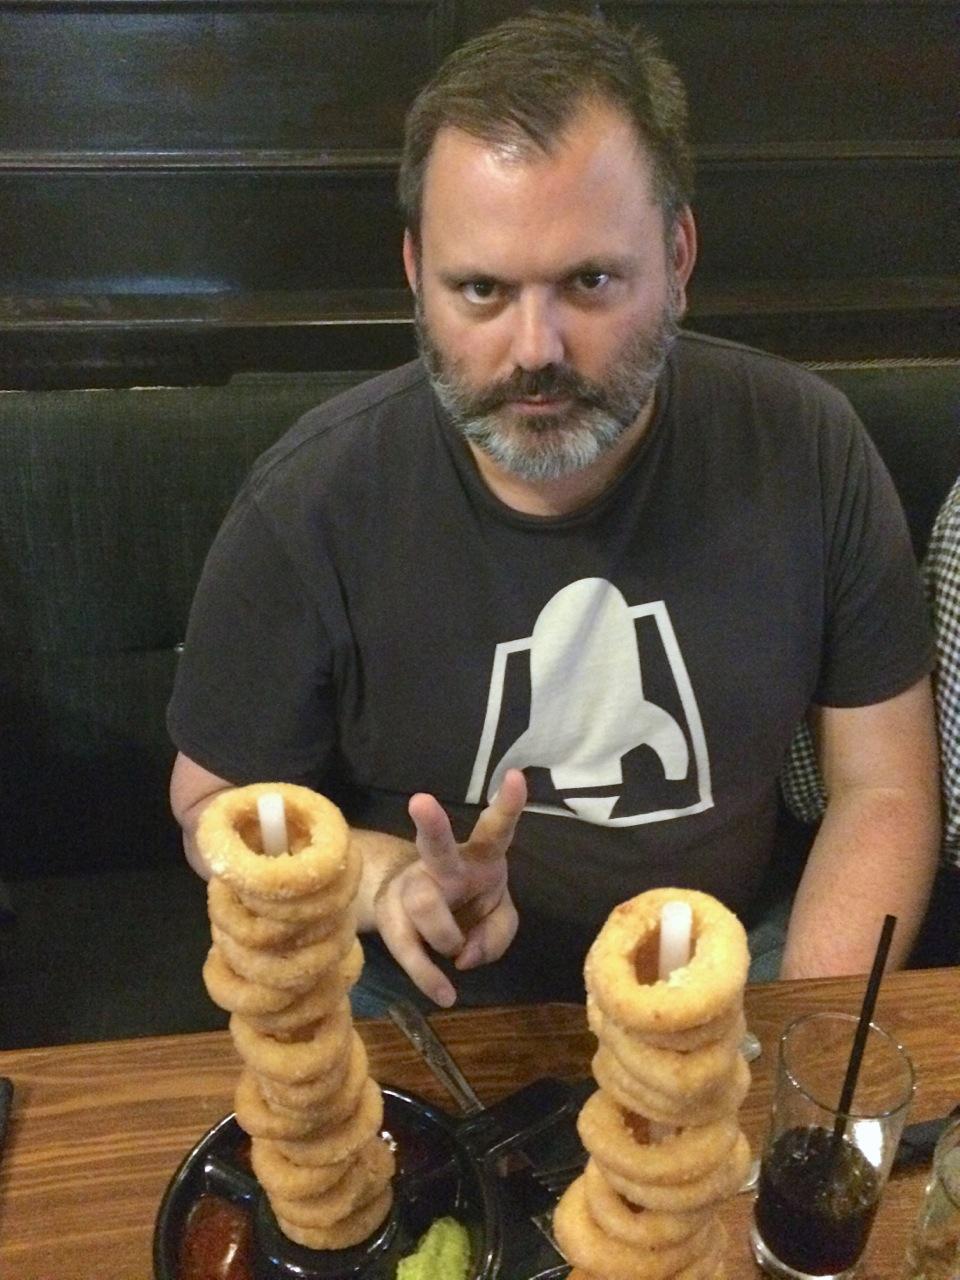 https://i2.wp.com/fatgayvegan.com/wp-content/uploads/2015/08/FGV-with-vegan-onion-rings.jpg?fit=960%2C1280&ssl=1